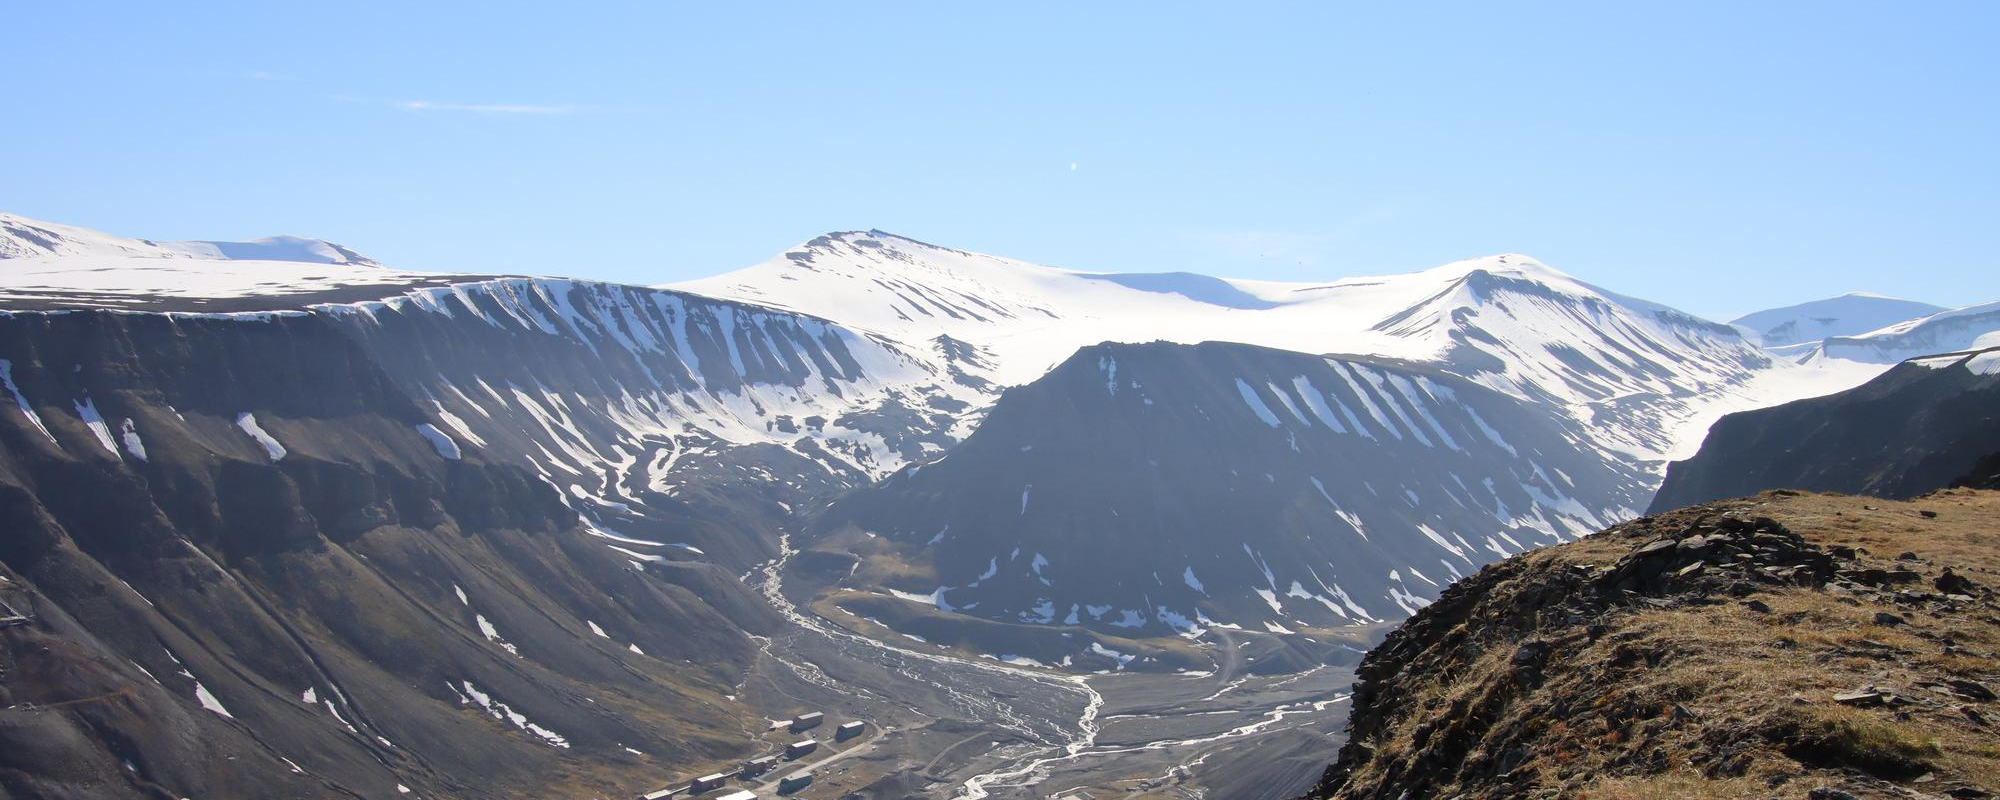 Spitzbergen Lars Hiertafjellet